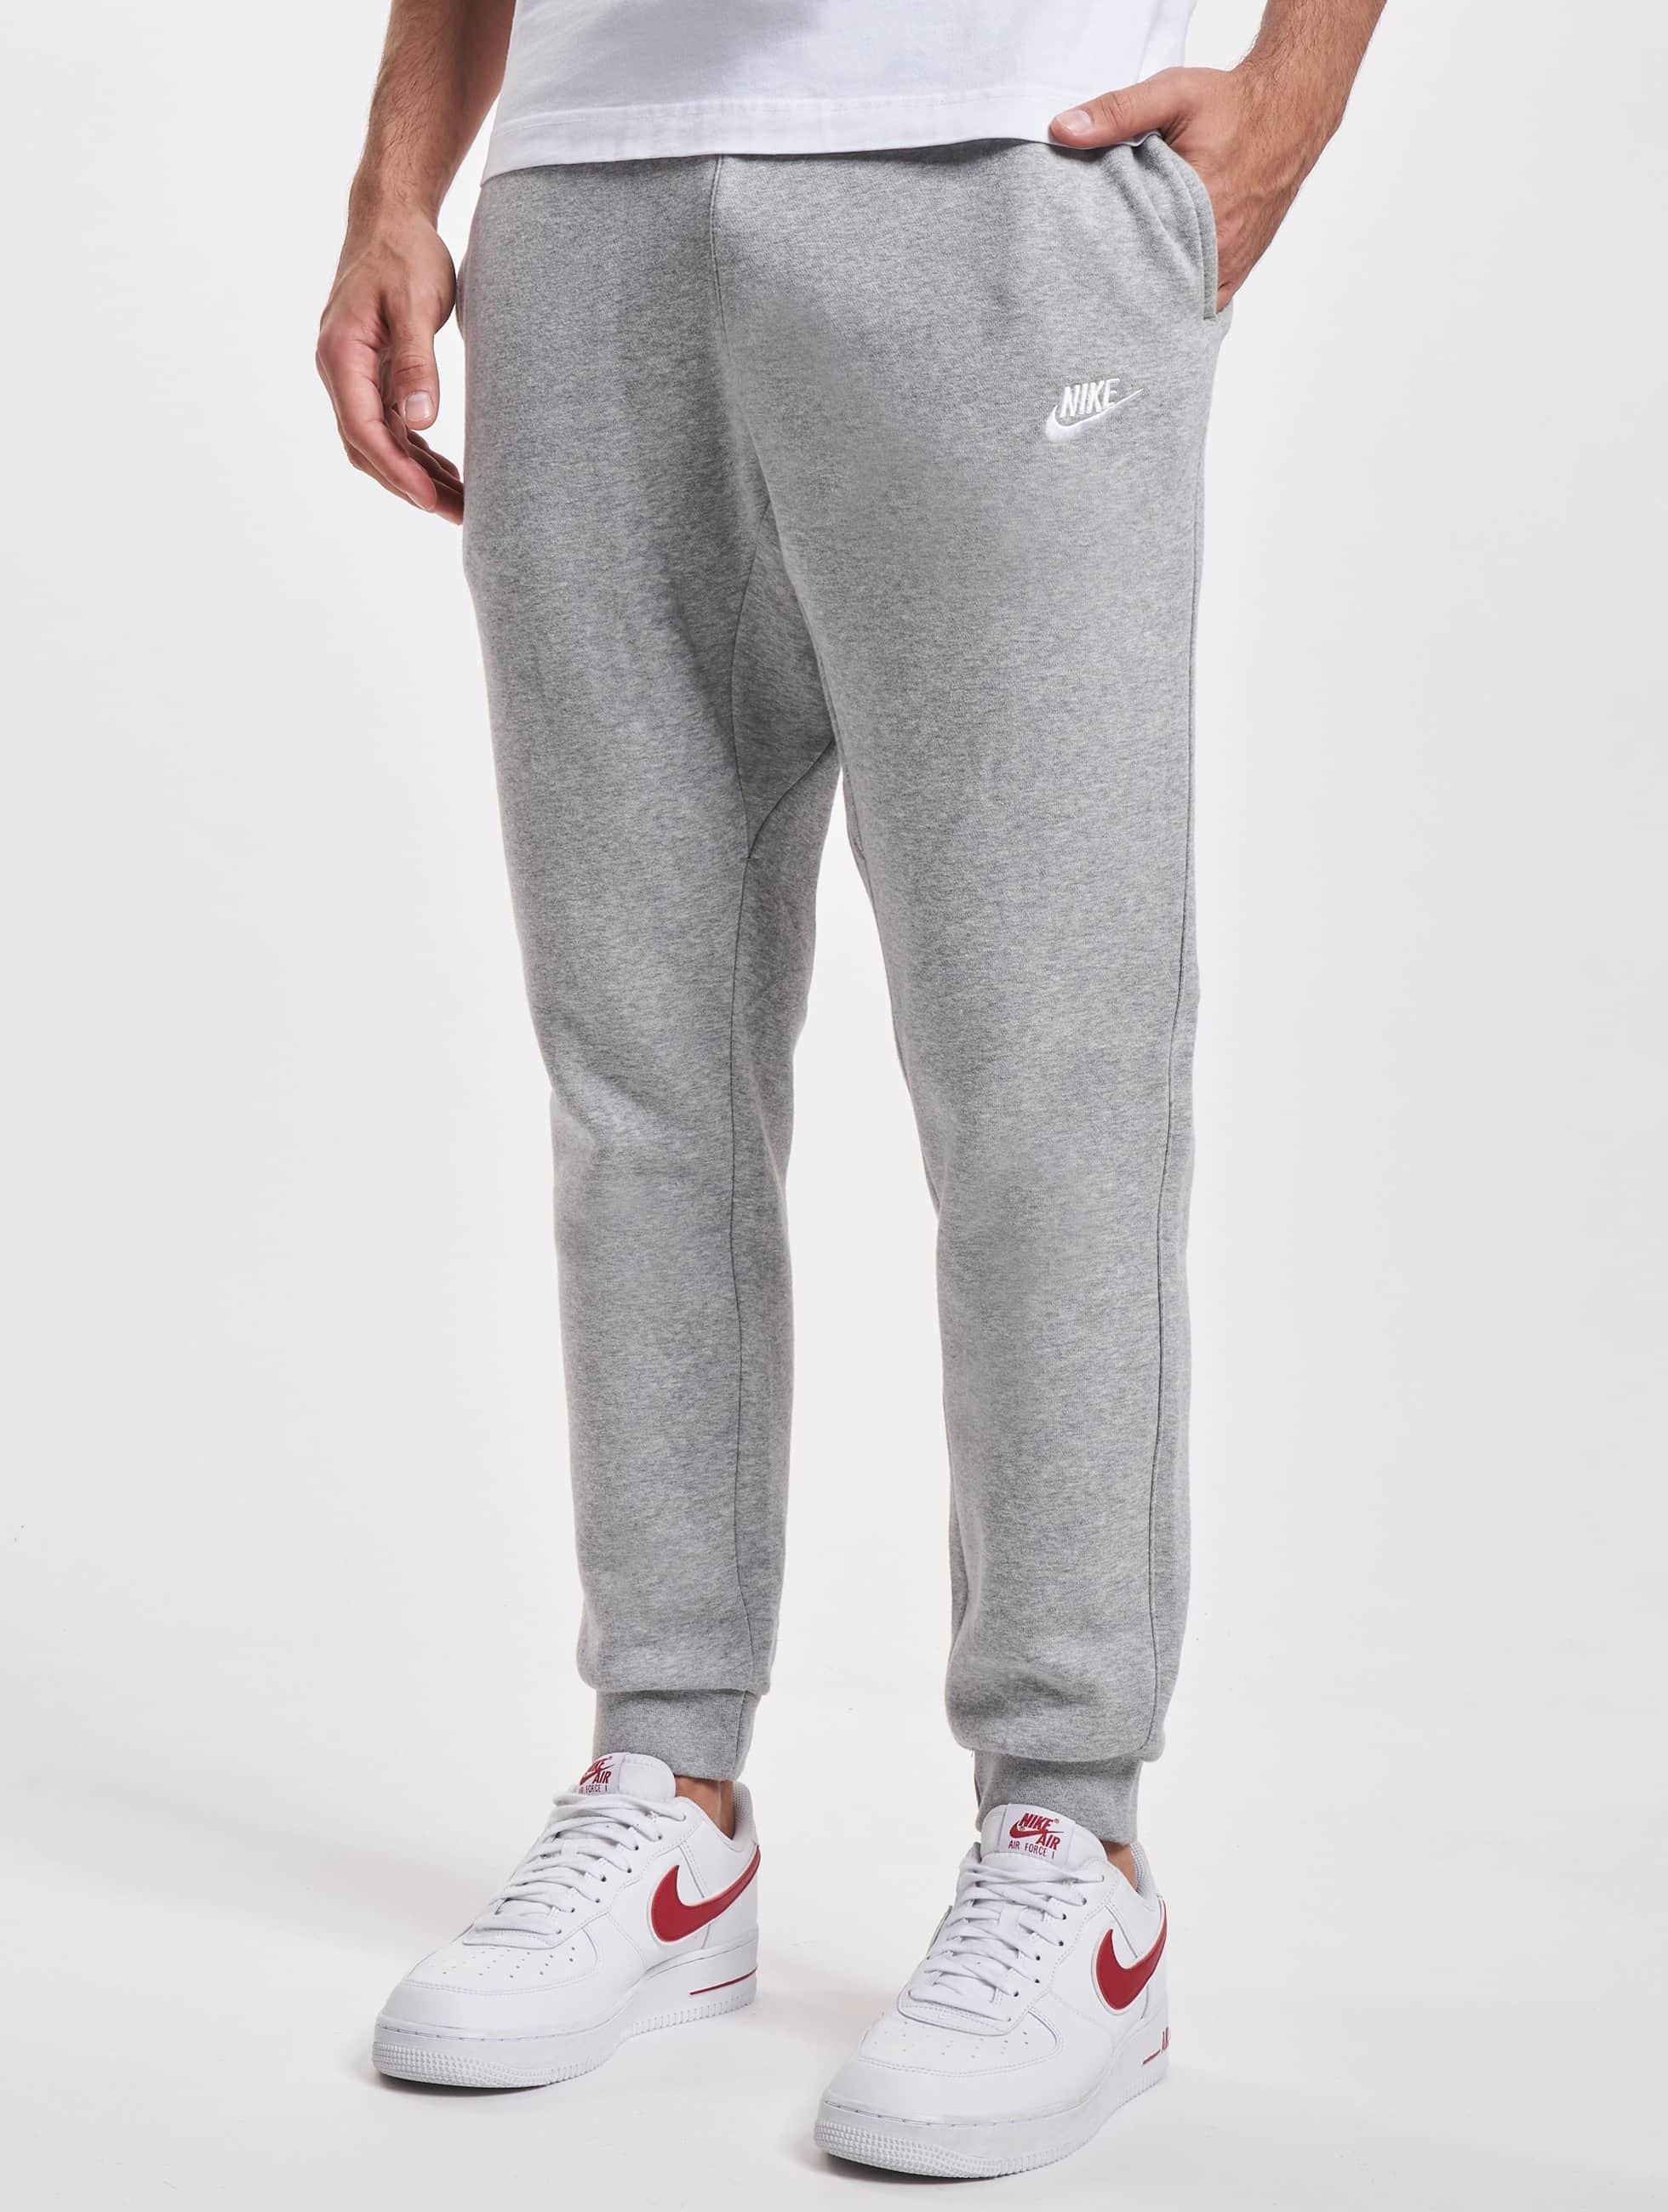 new styles 4838c b1d55 nike jogginghose nsw flc club grau